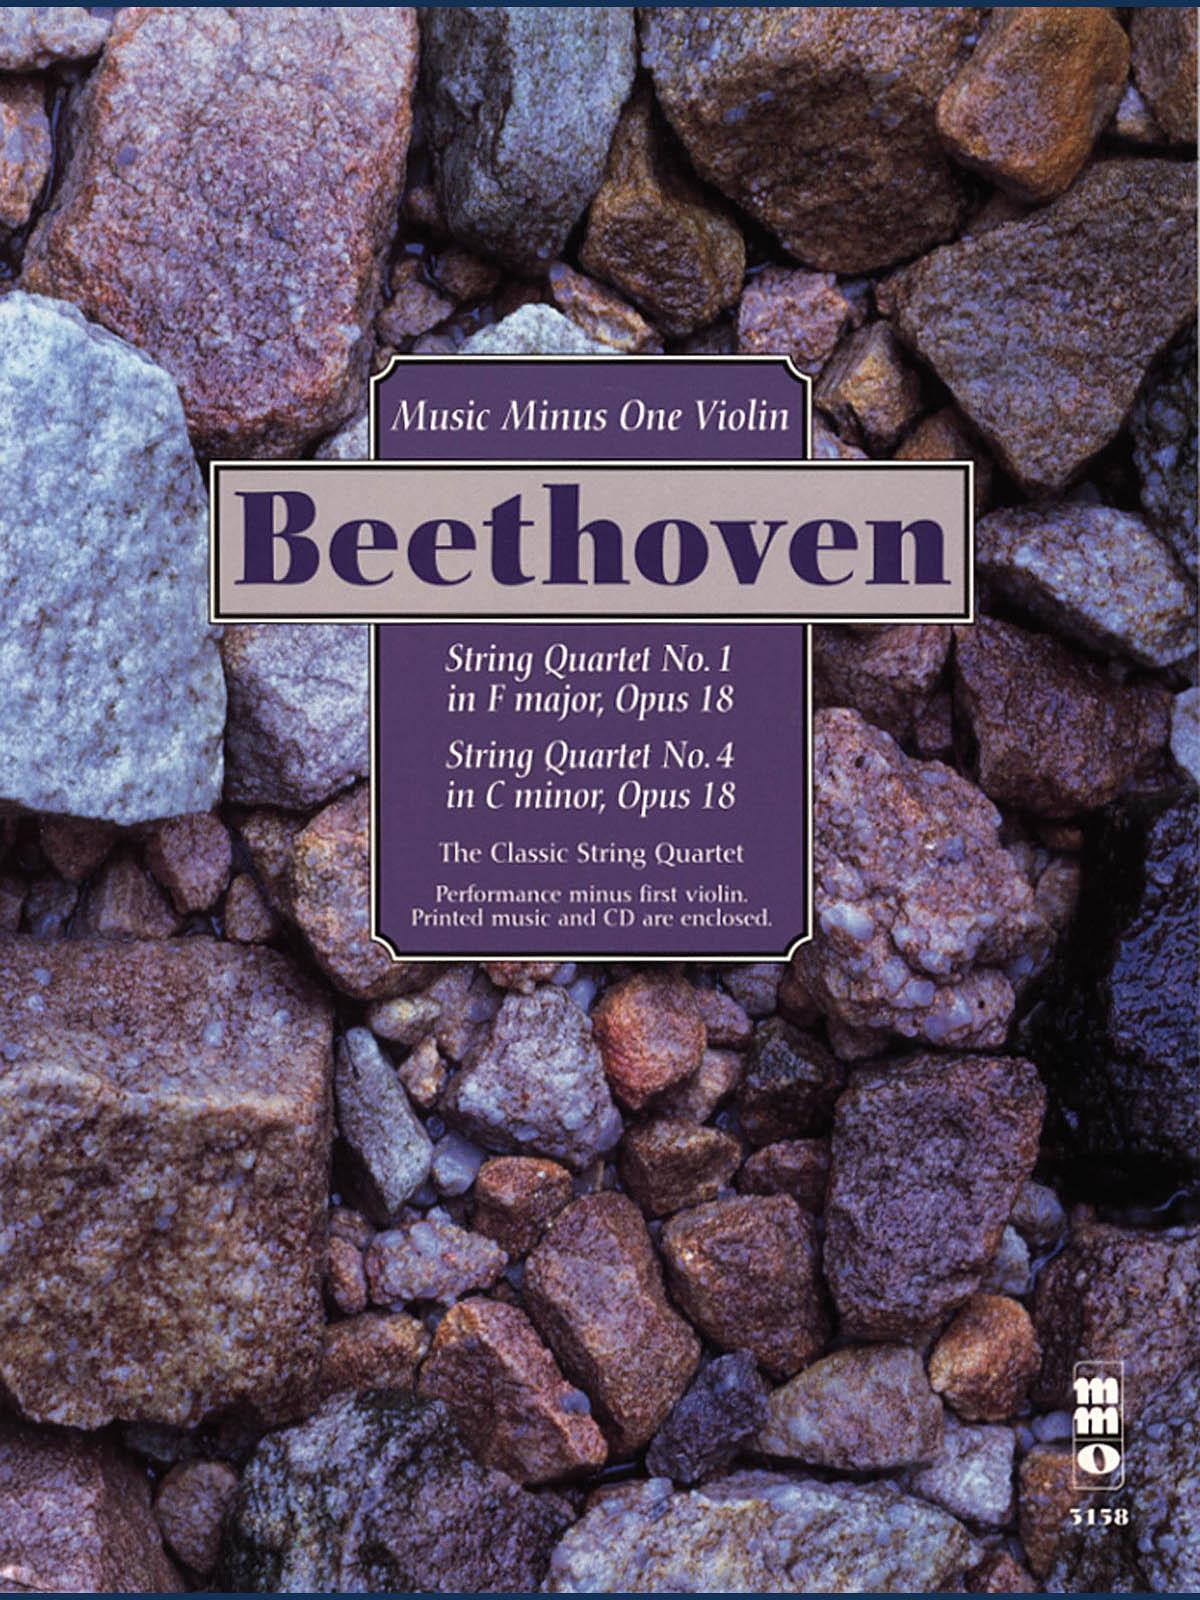 Ludwig van Beethoven: String Quartets  Op. 18: No. 1 in F Major and No. 4: Violin: